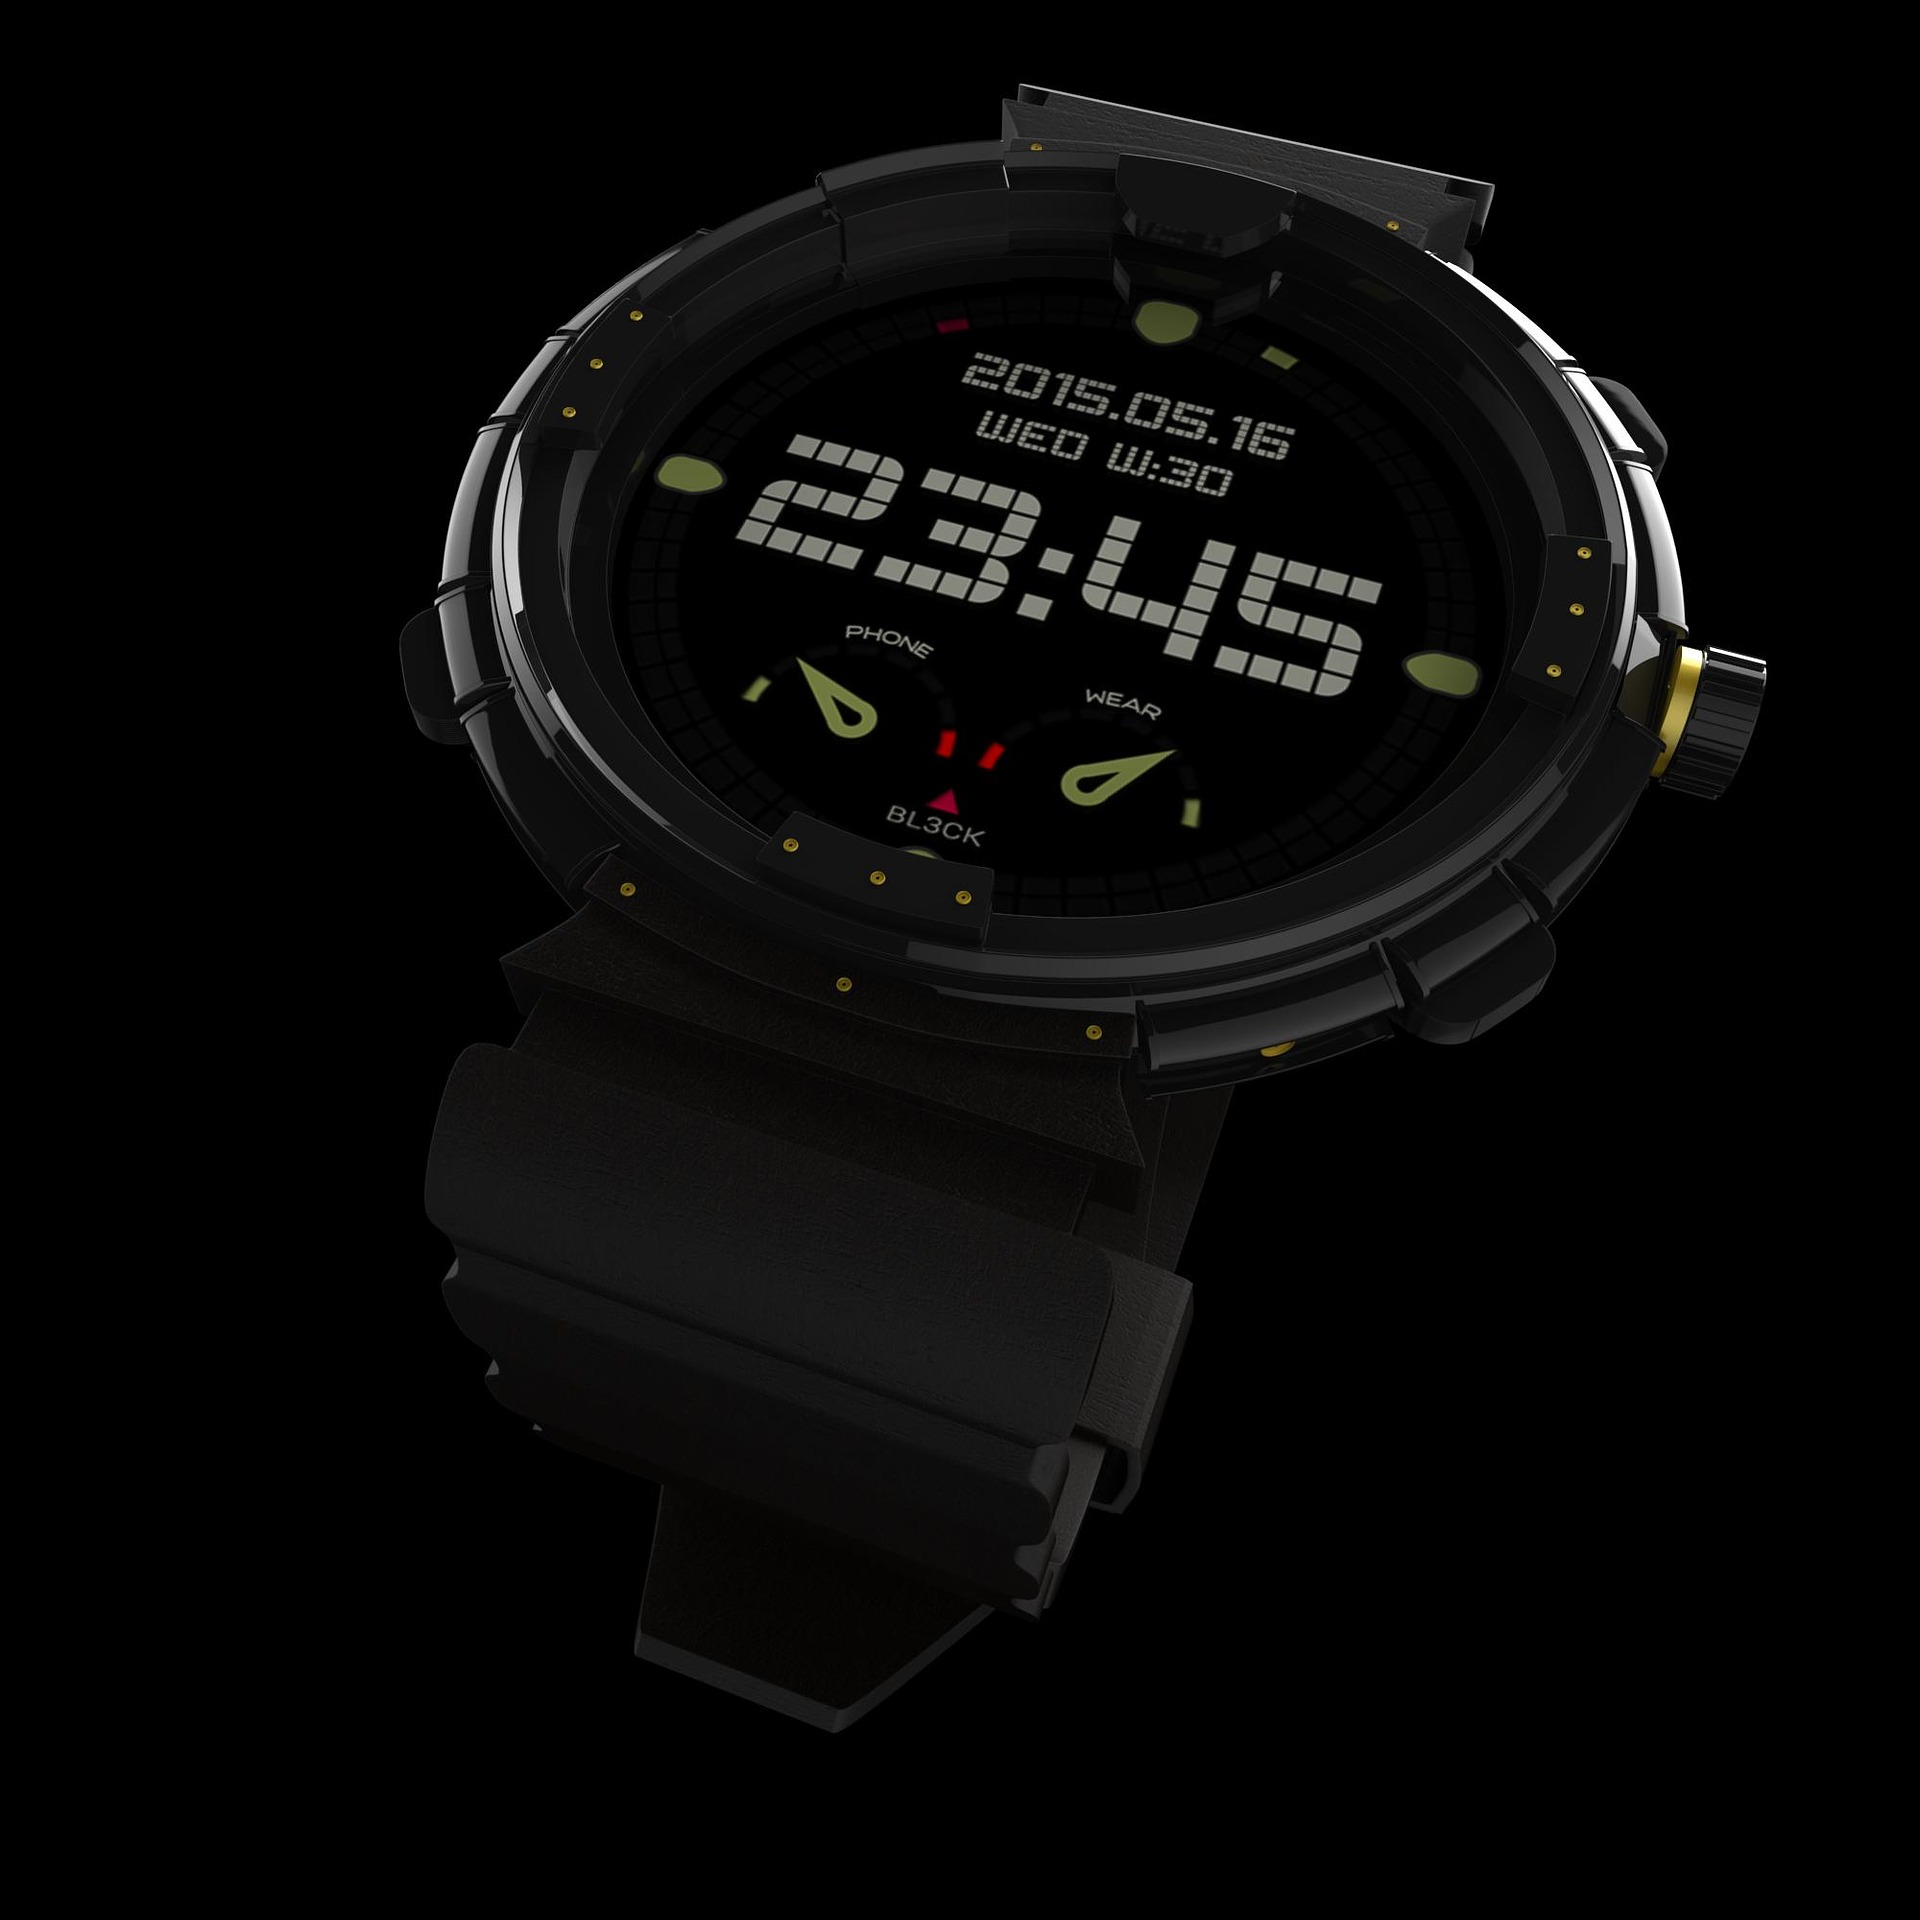 6c9895d7b5c8 I migliori orologi digitali da polso